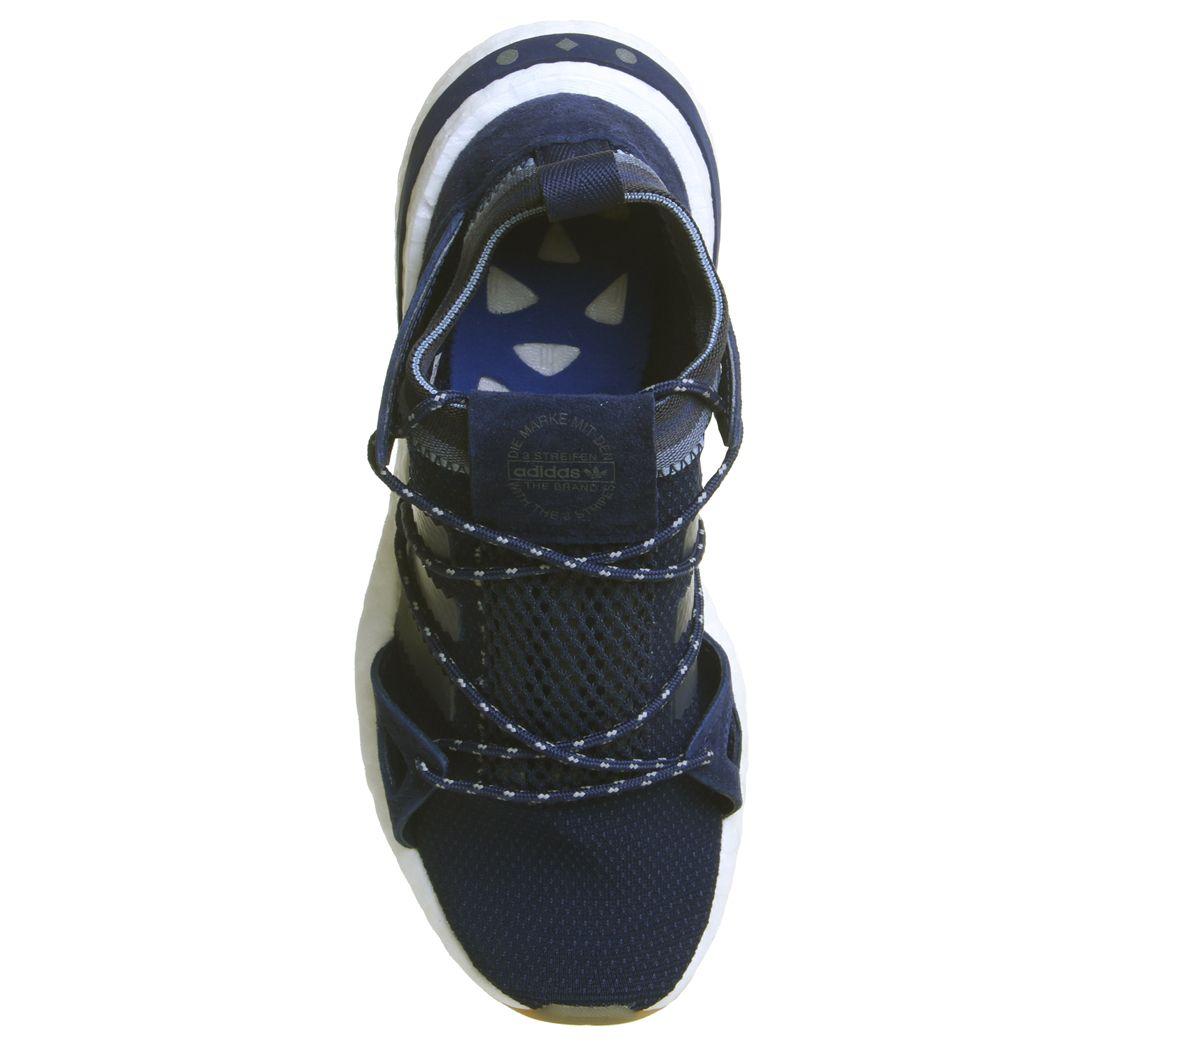 Mujer-Adidas-Arkyn-Zapatillas-Universo-Azul-Oscuro-Goma-Zapatillas-Deportivas miniatura 10